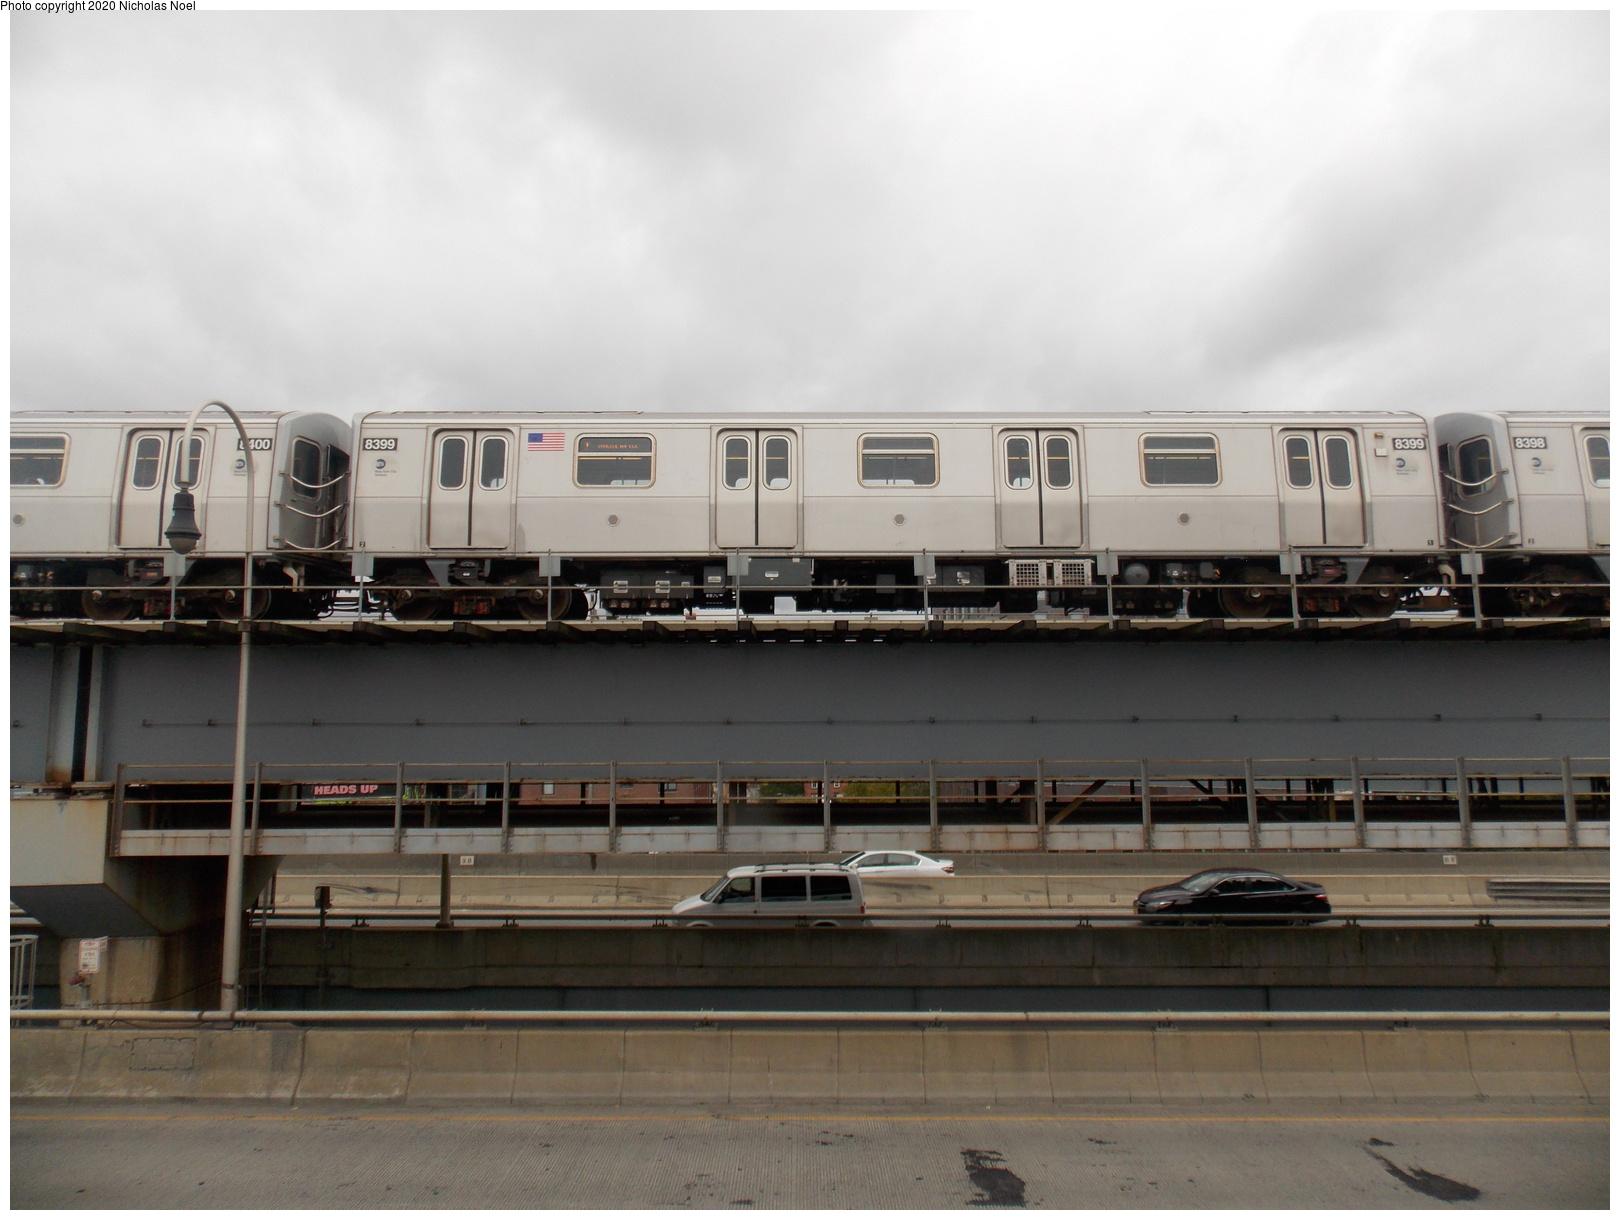 (566k, 1620x1220)<br><b>Country:</b> United States<br><b>City:</b> New York<br><b>System:</b> New York City Transit<br><b>Line:</b> BMT Nassau Street-Jamaica Line<br><b>Location:</b> Williamsburg Bridge<br><b>Route:</b> J<br><b>Car:</b> R-160A-1 (Alstom, 2005-2008, 4 car sets) 8399 <br><b>Photo by:</b> Nicholas Noel<br><b>Date:</b> 10/22/2016<br><b>Viewed (this week/total):</b> 0 / 230